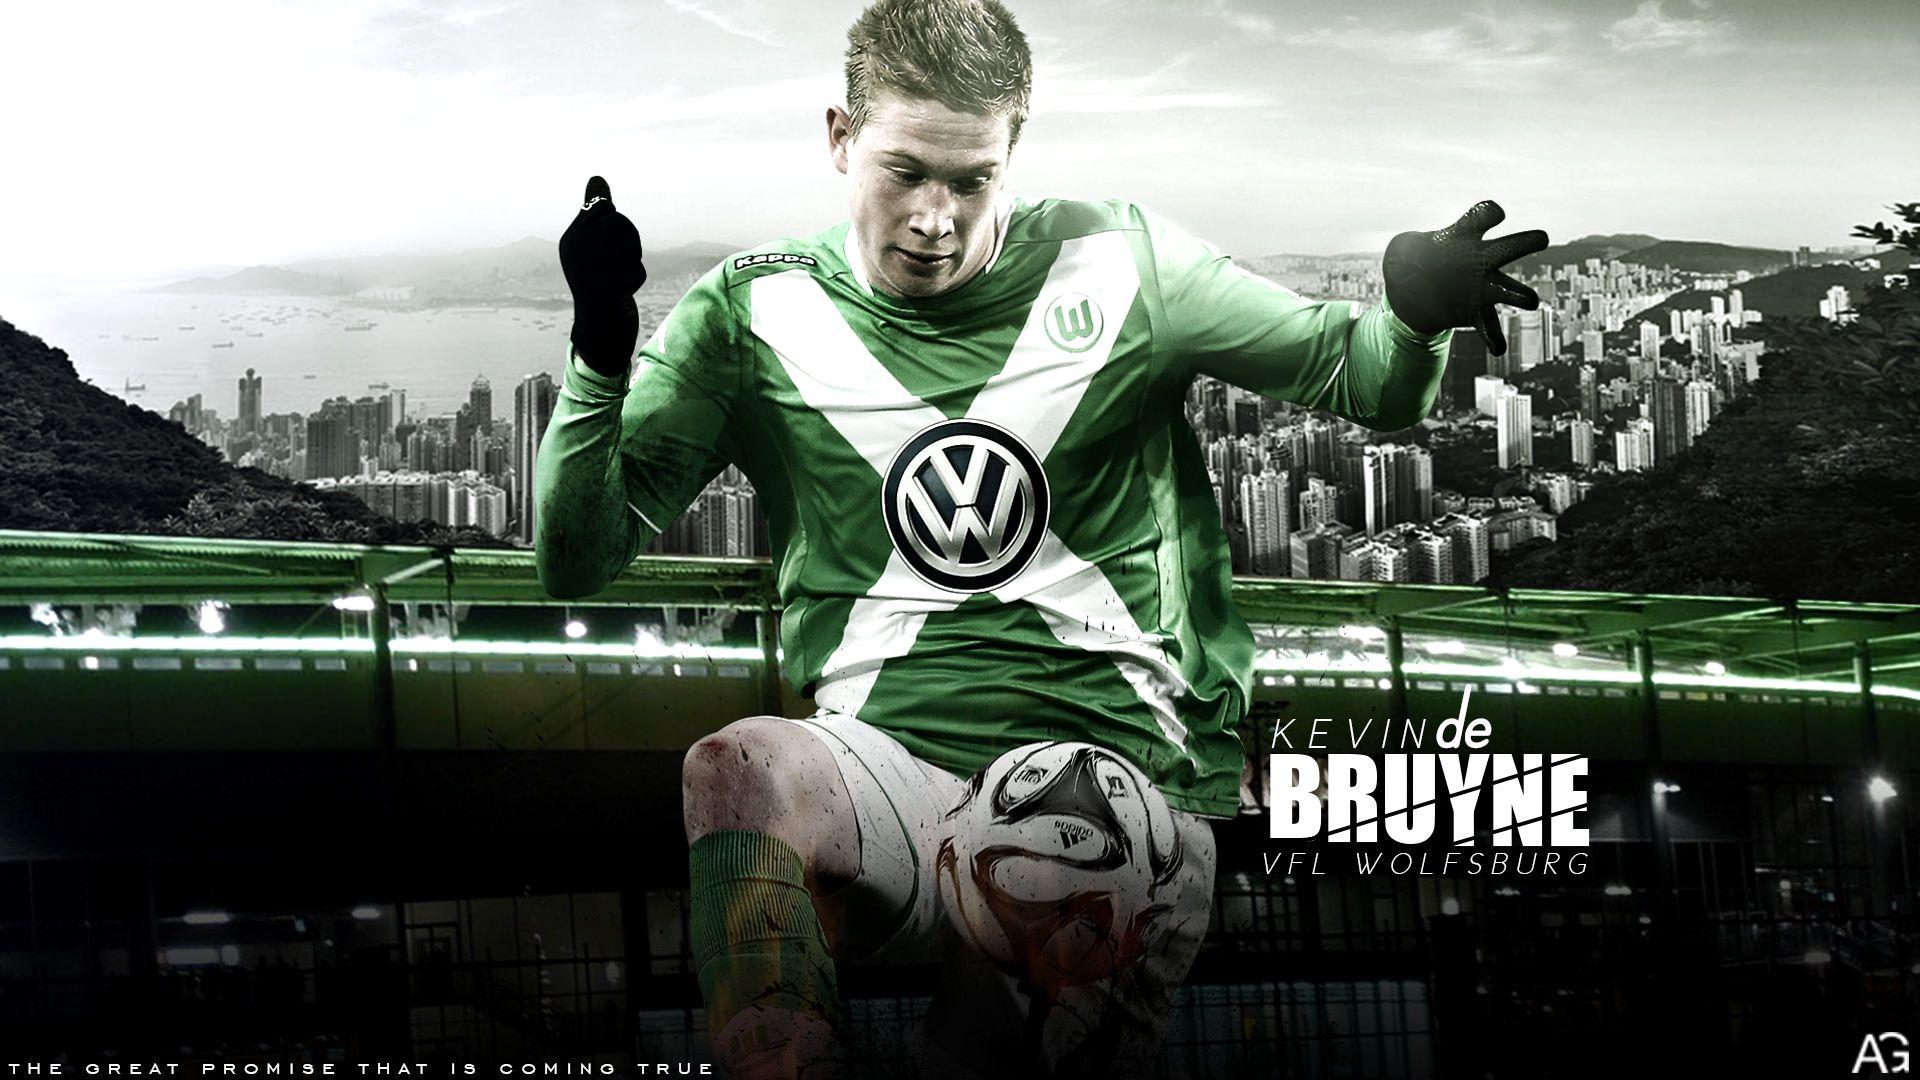 Kevin De Bruyne Wolfsburg 2014/2015 Wallpaper